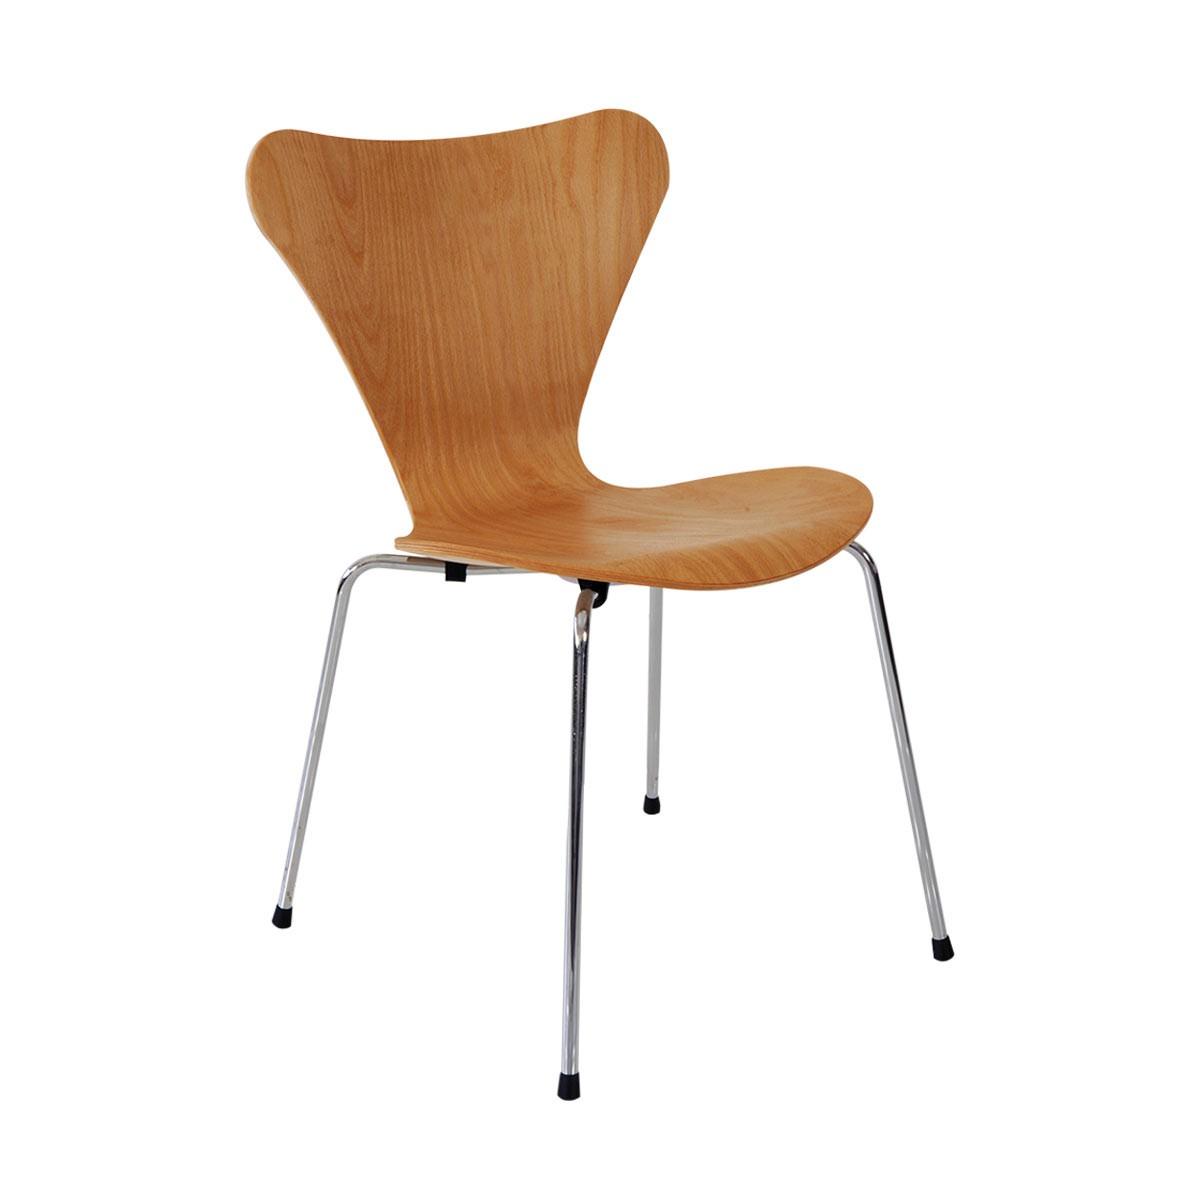 Arne Jacobsen Series 7 Chair CK45